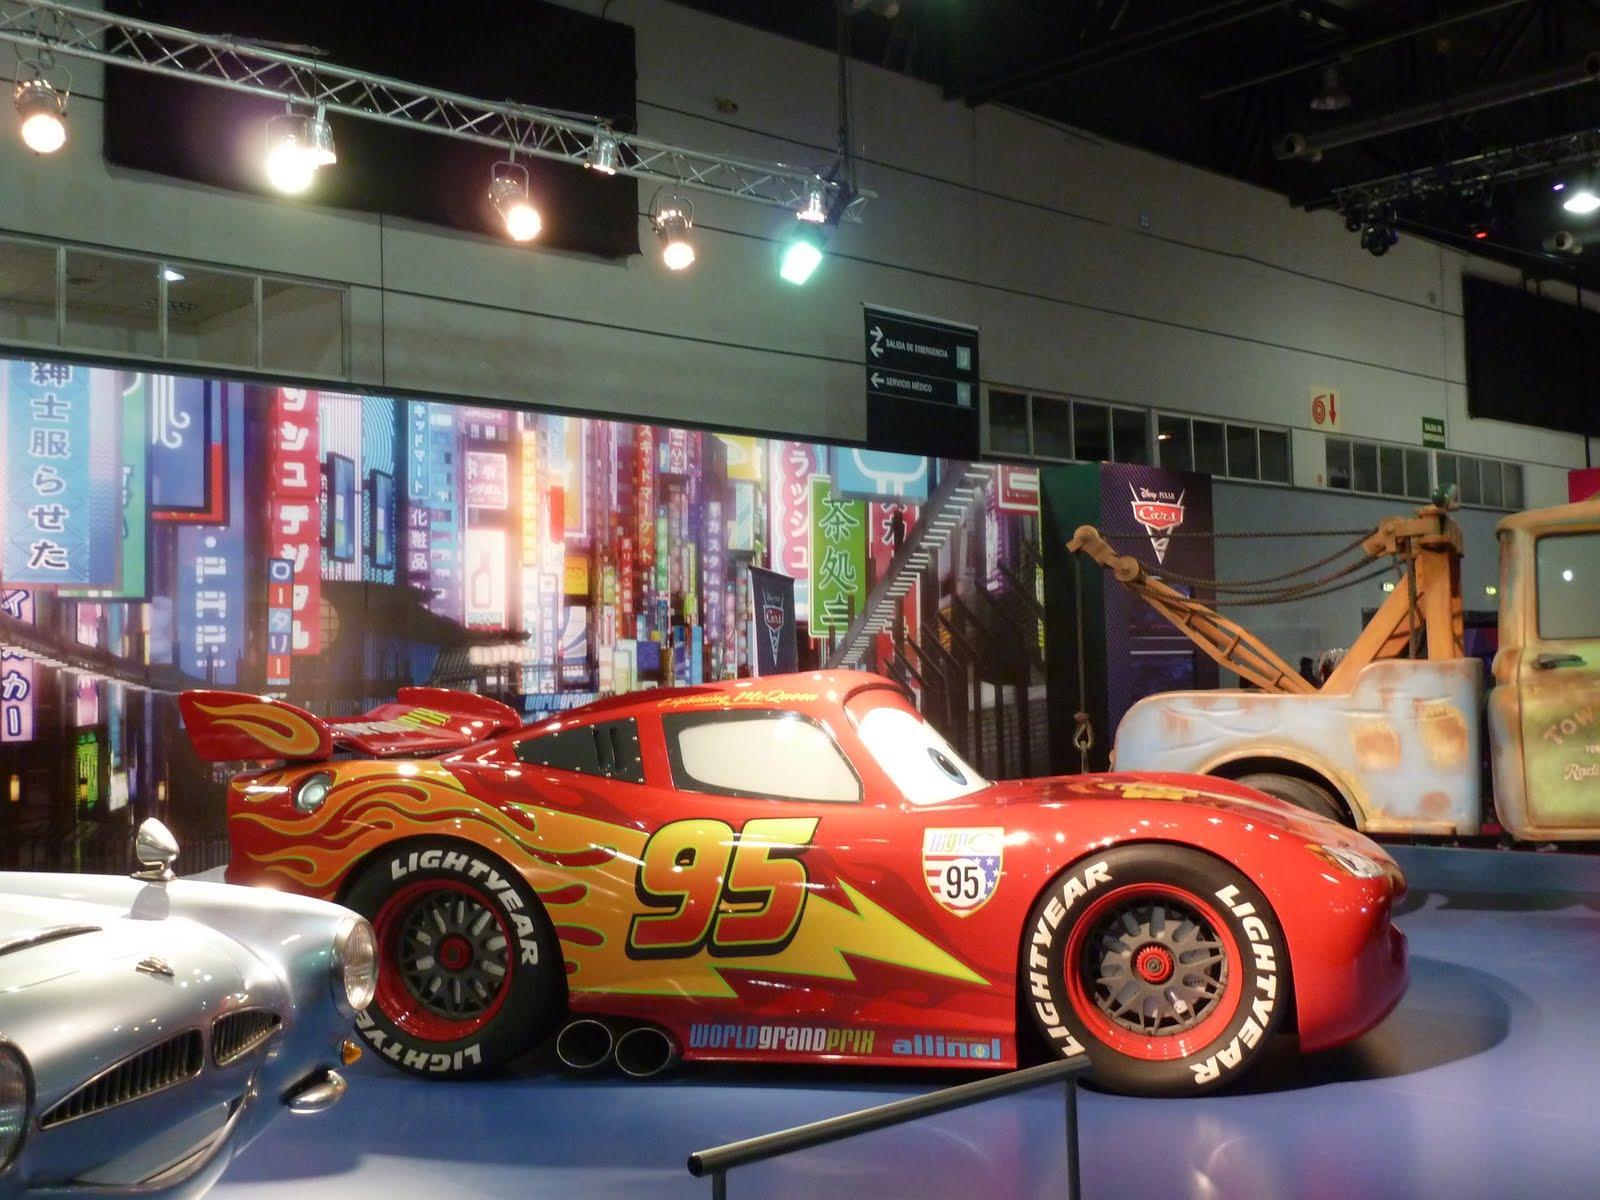 Diario de placeres cars 2 grand prix por el mundo for Salon pixar paris